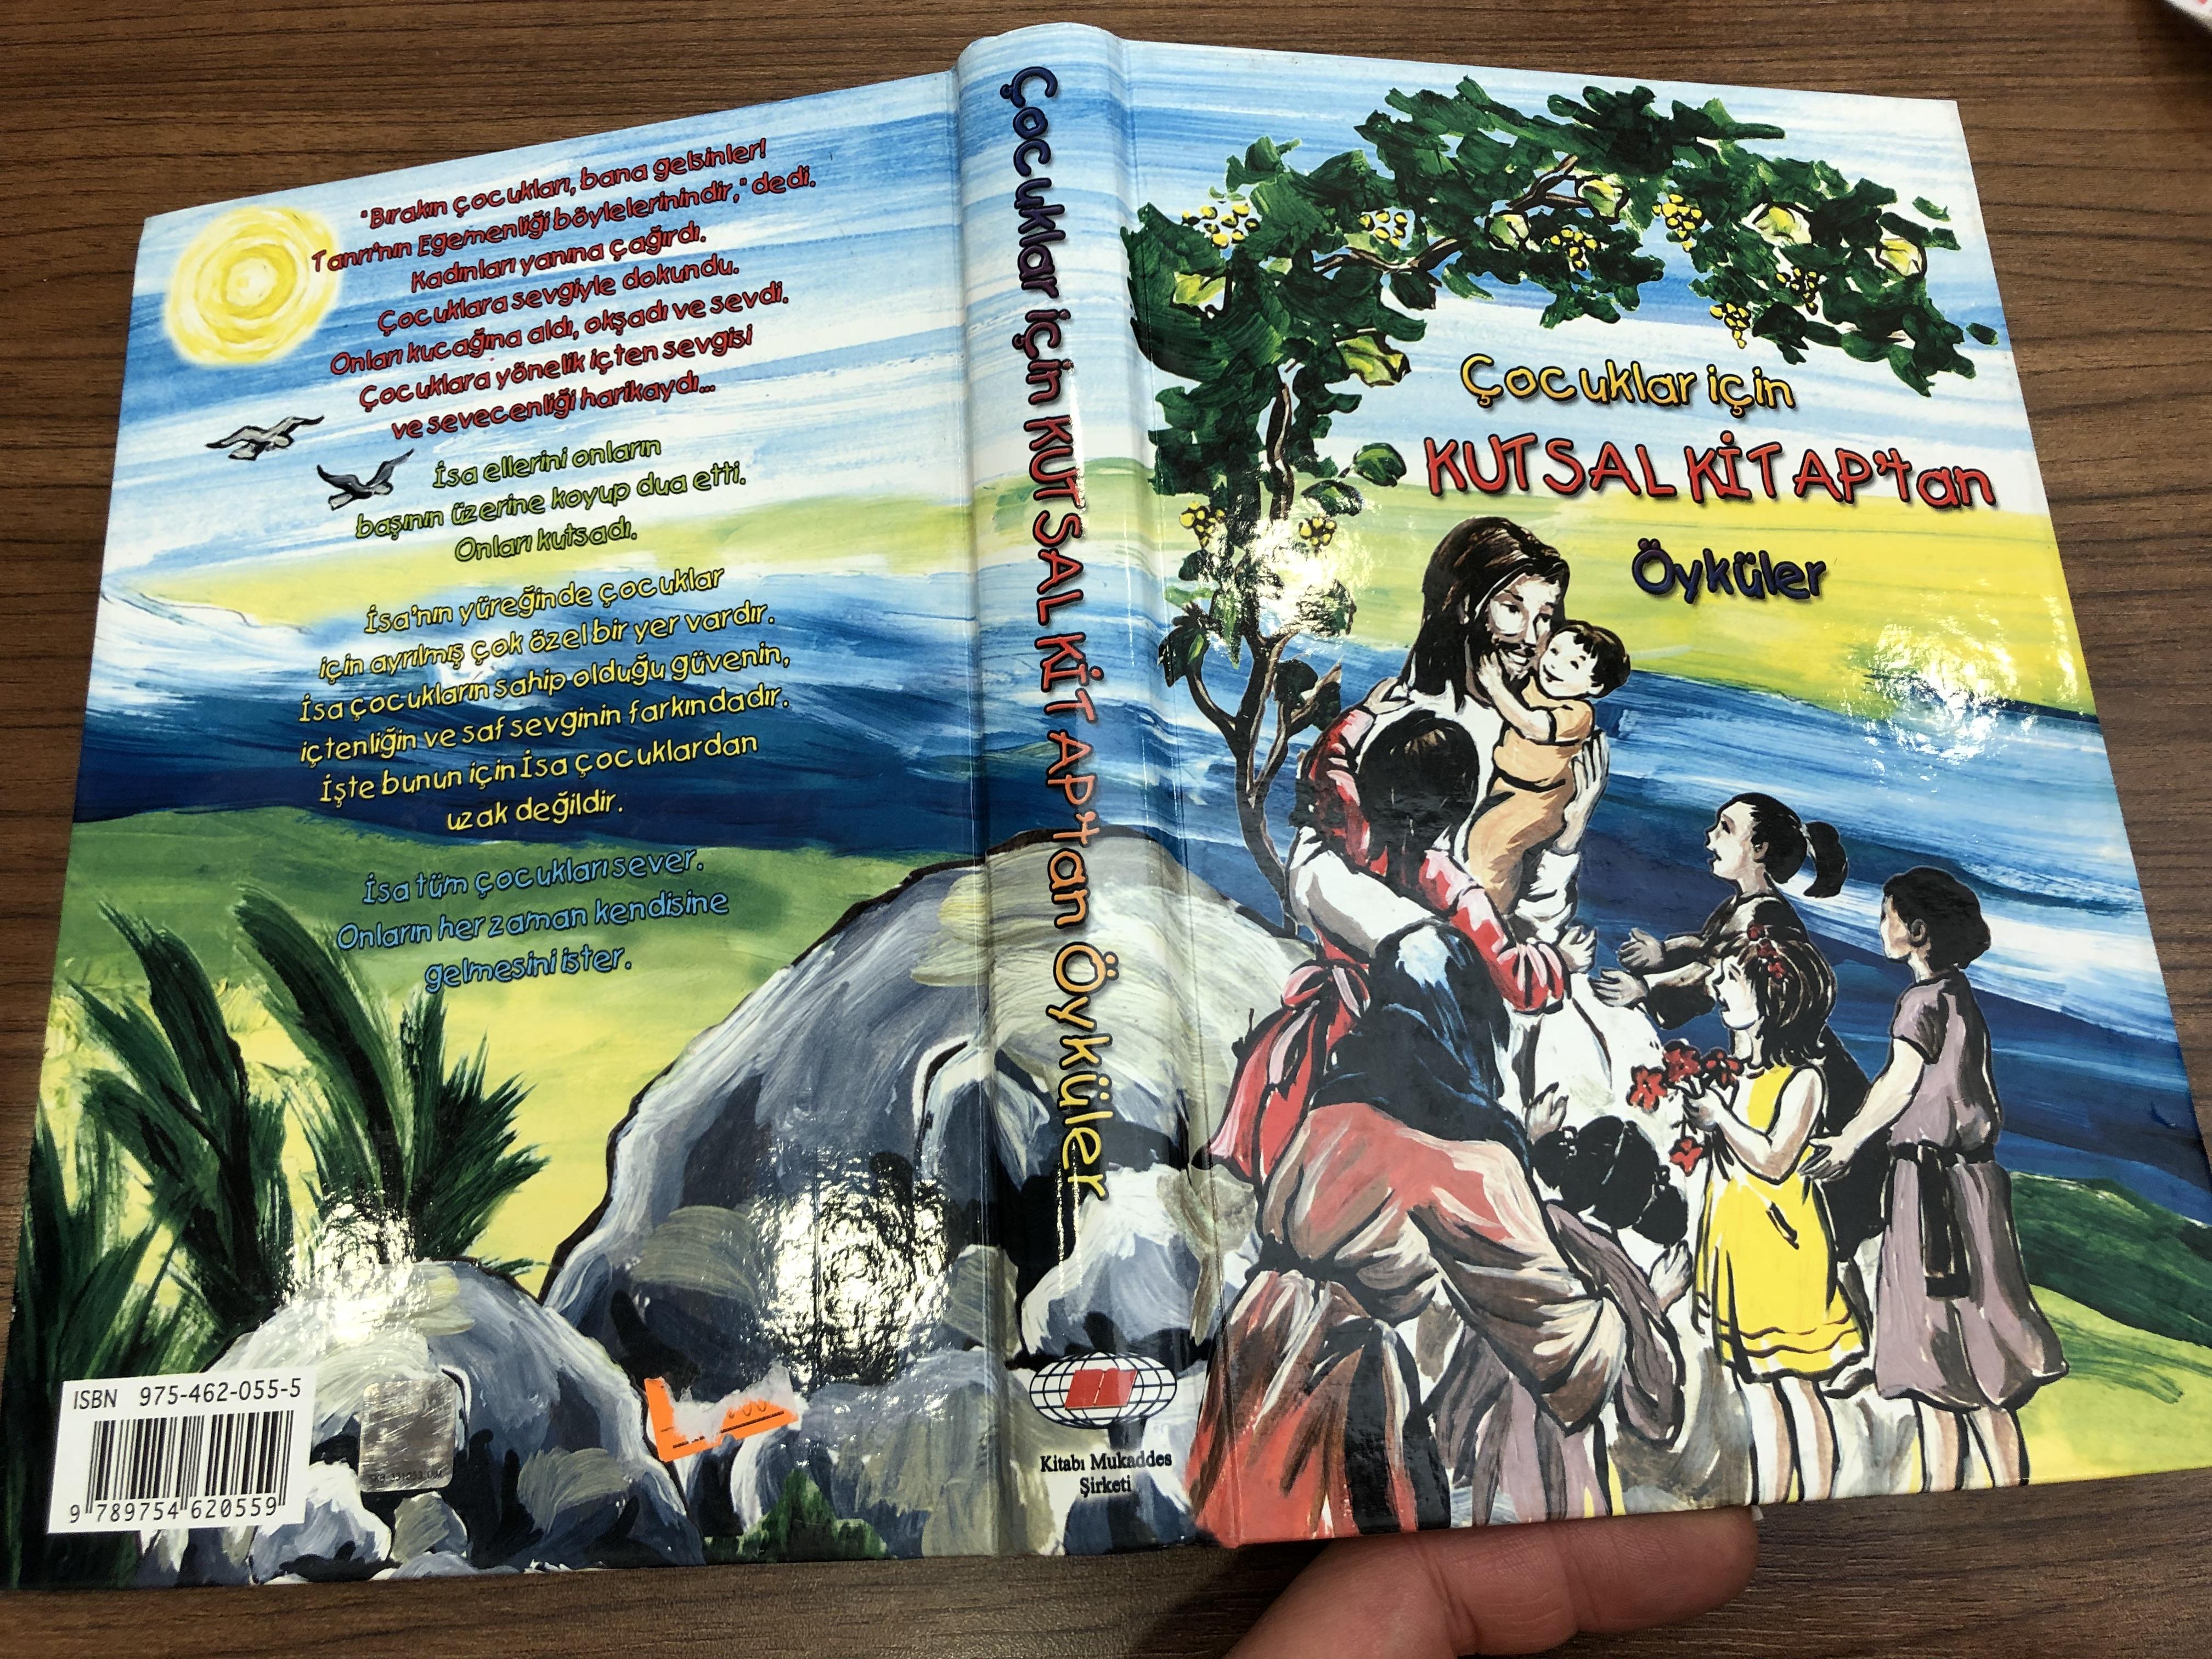 -ocuklar-i-in-kutsal-kitap-tan-yk-ler-yazan-soner-tufan-bible-stories-for-children-in-turkish-11-.jpg